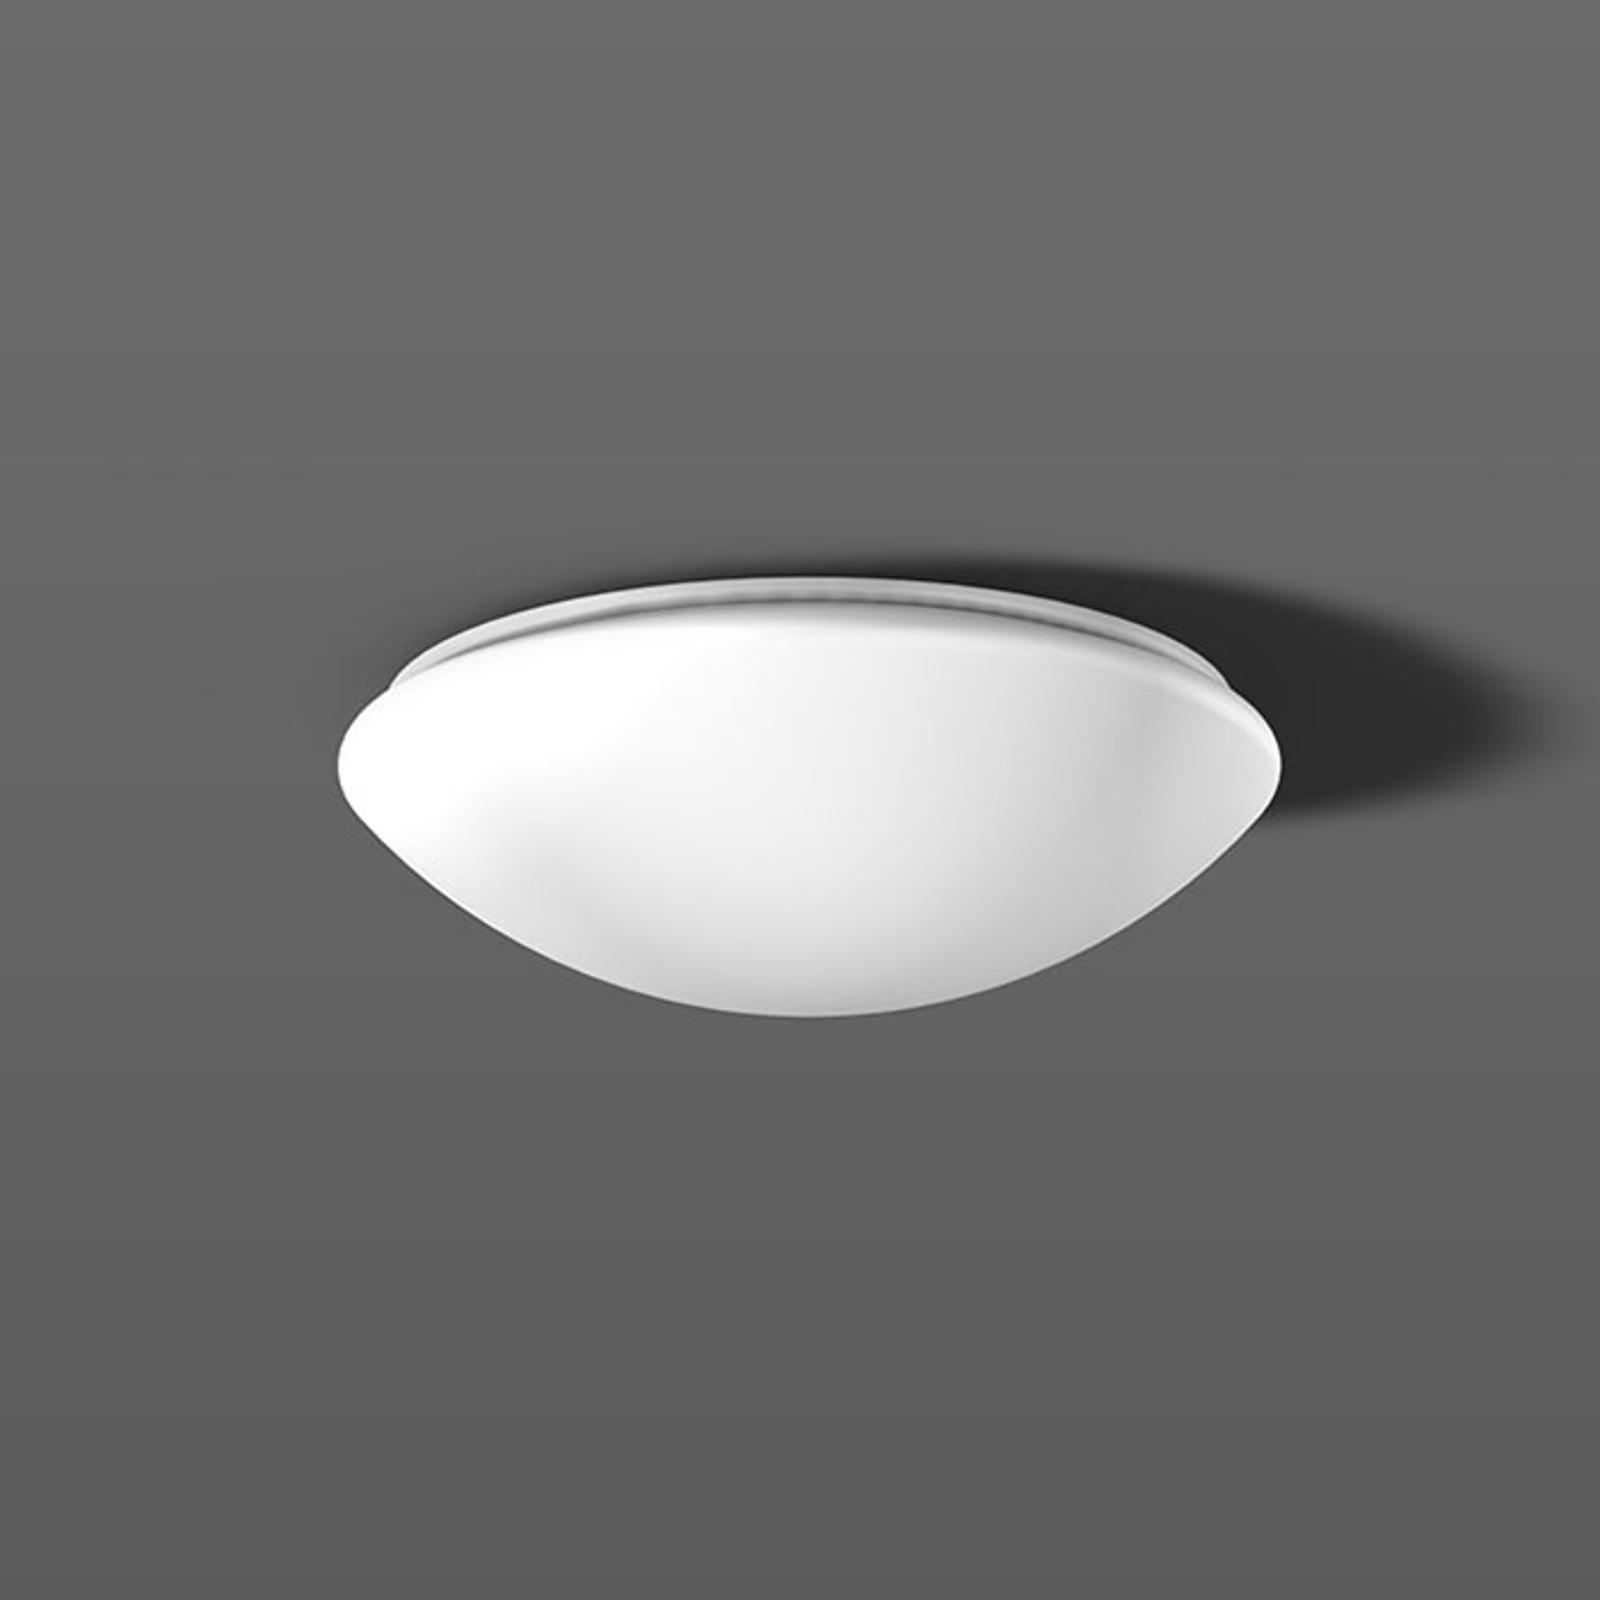 RZB Flat Polymero kattovalaisin DALI 14W 30cm 840